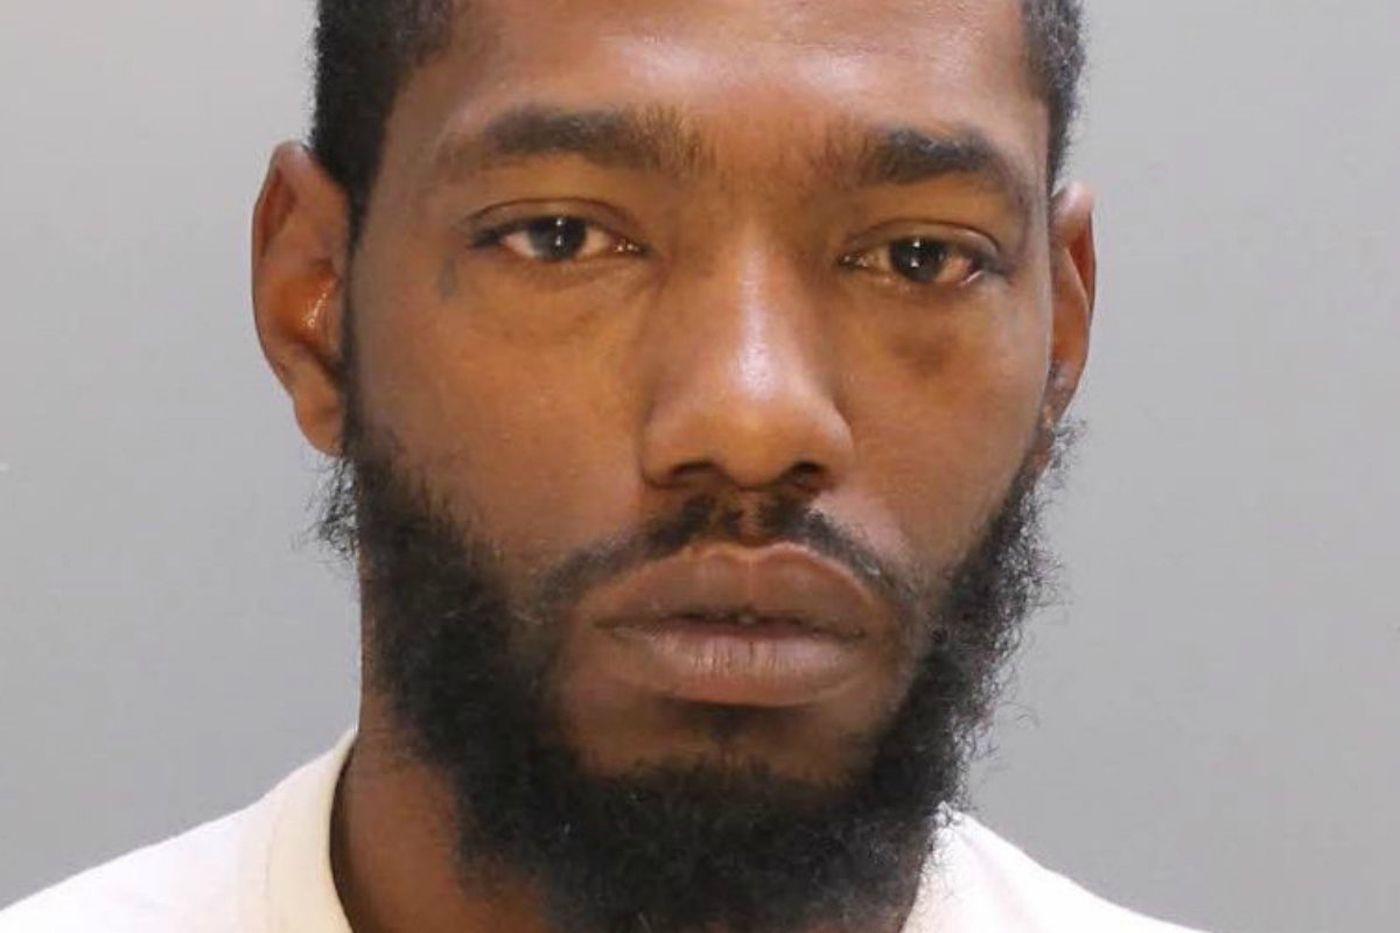 Jury acquits Philly man of rape, deadlocks on 2nd rape charge